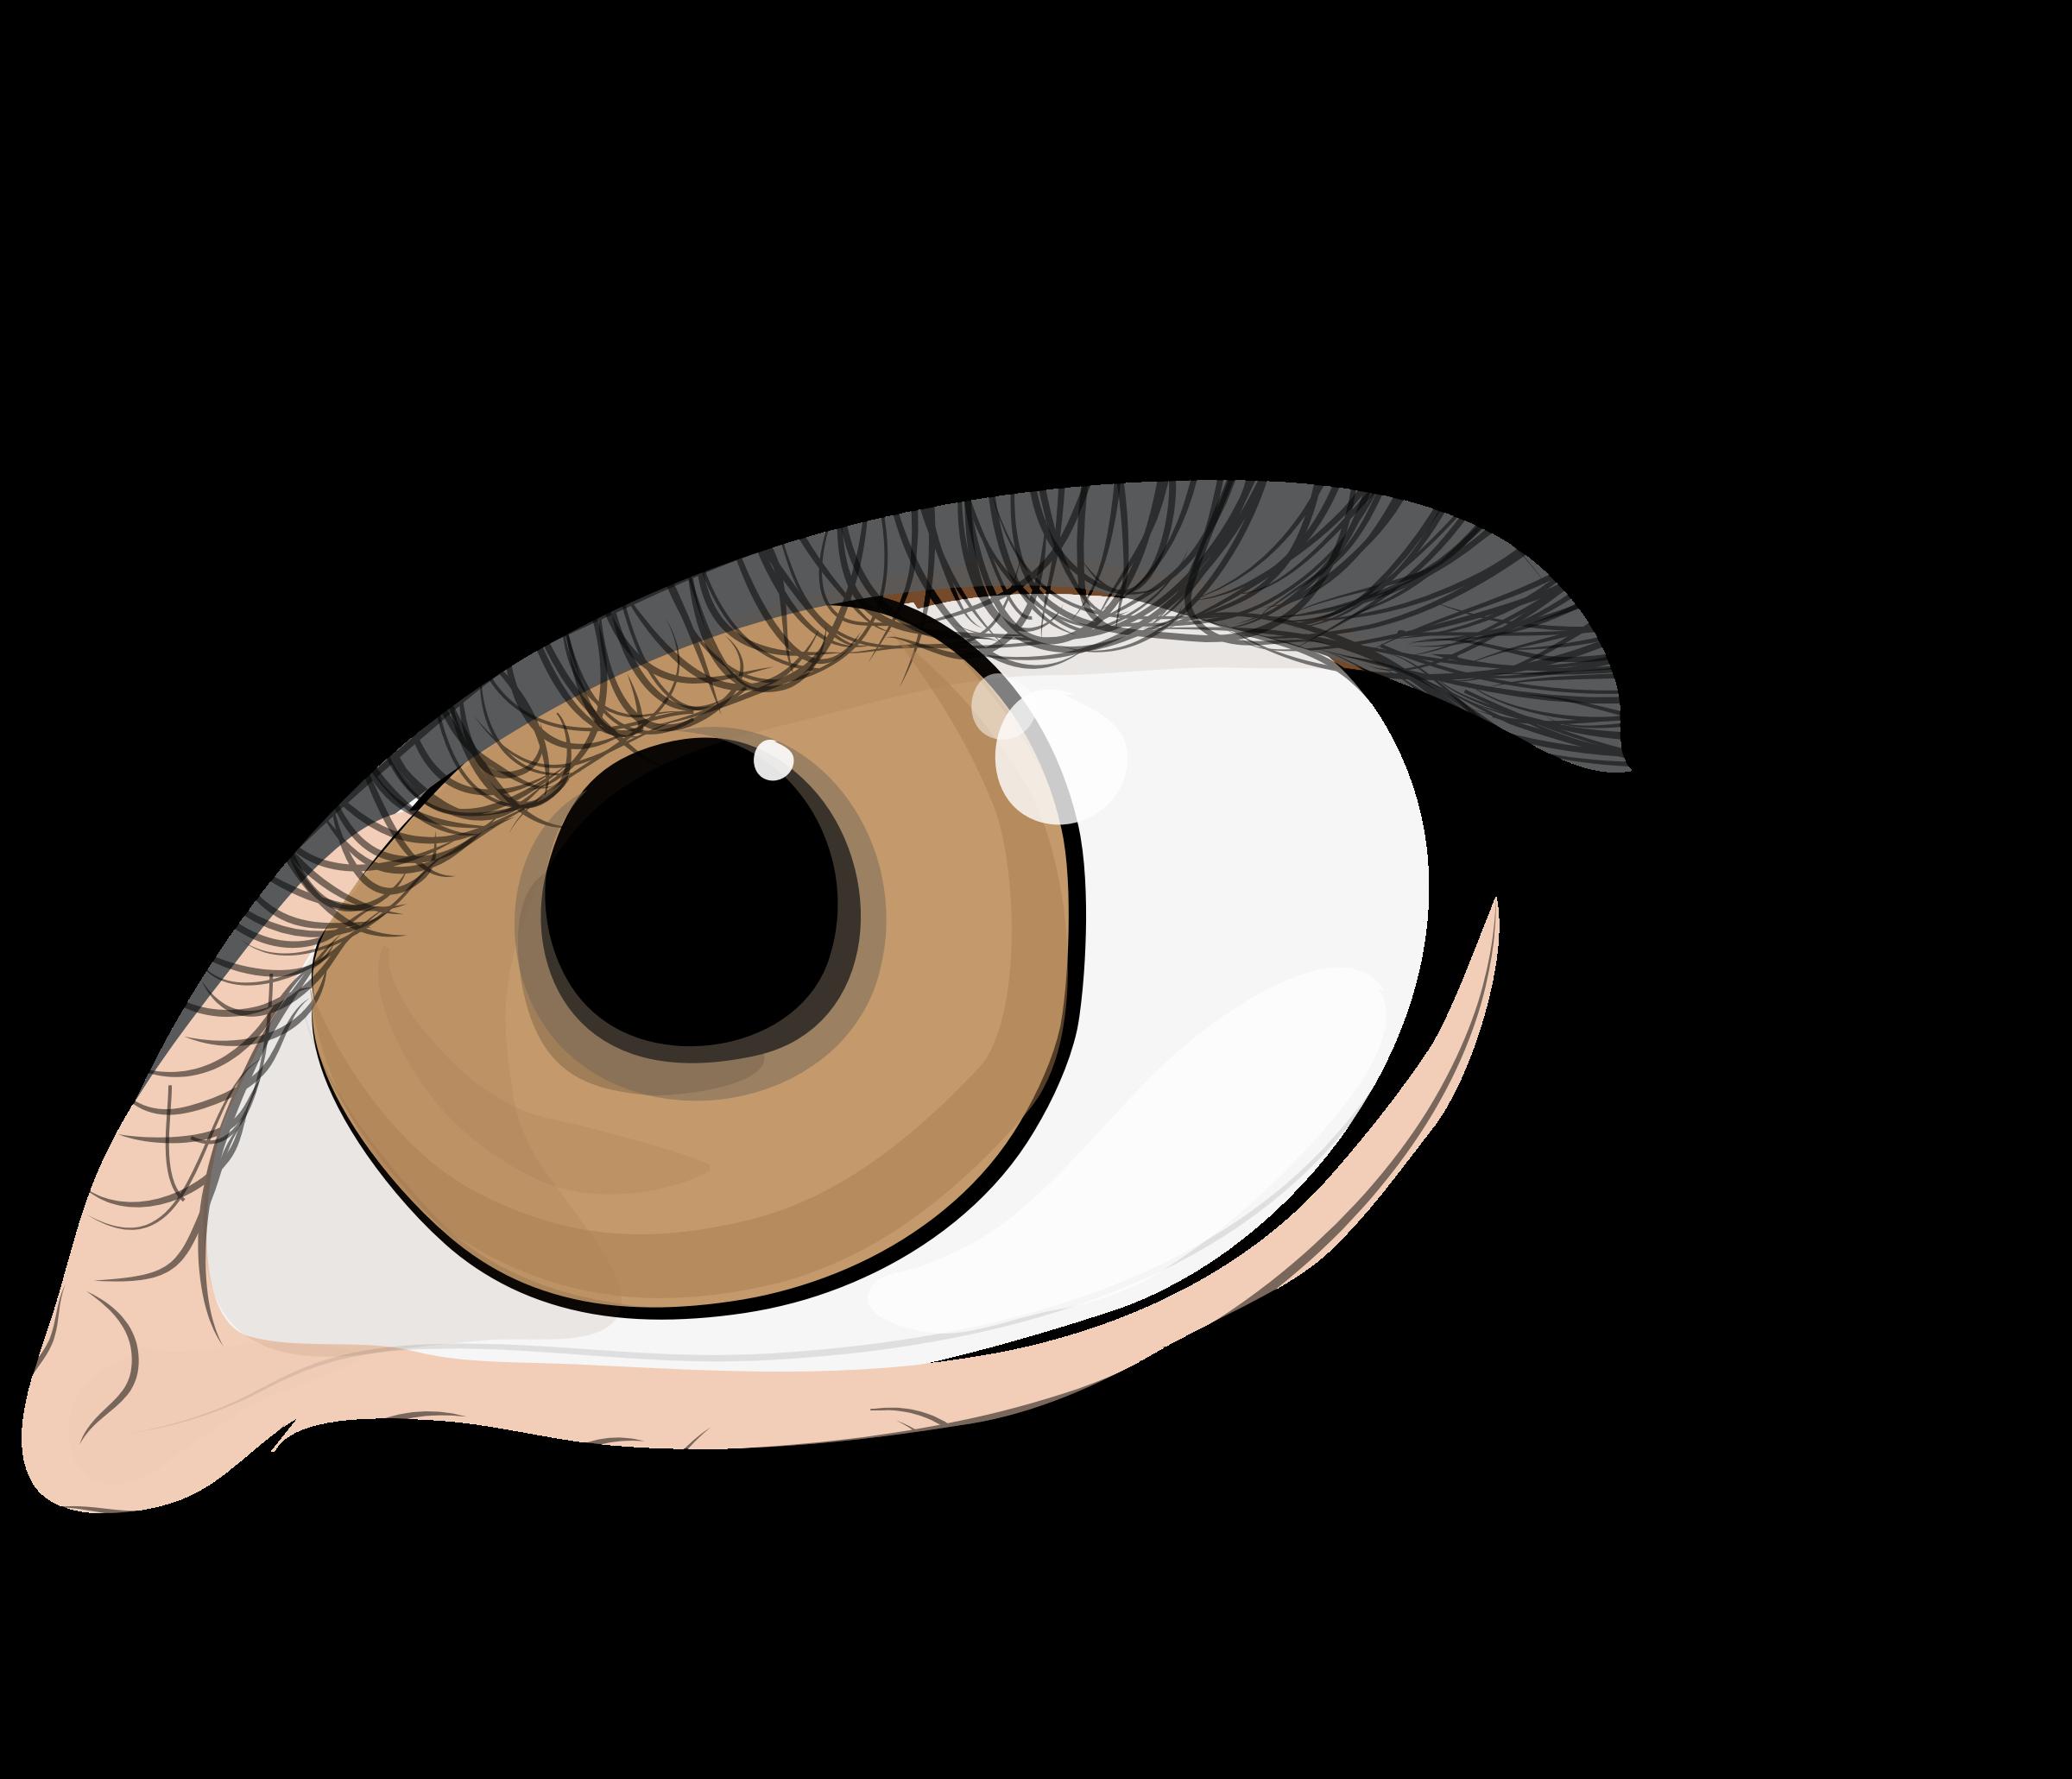 Eyelashes clipart woman's. Eye big image png